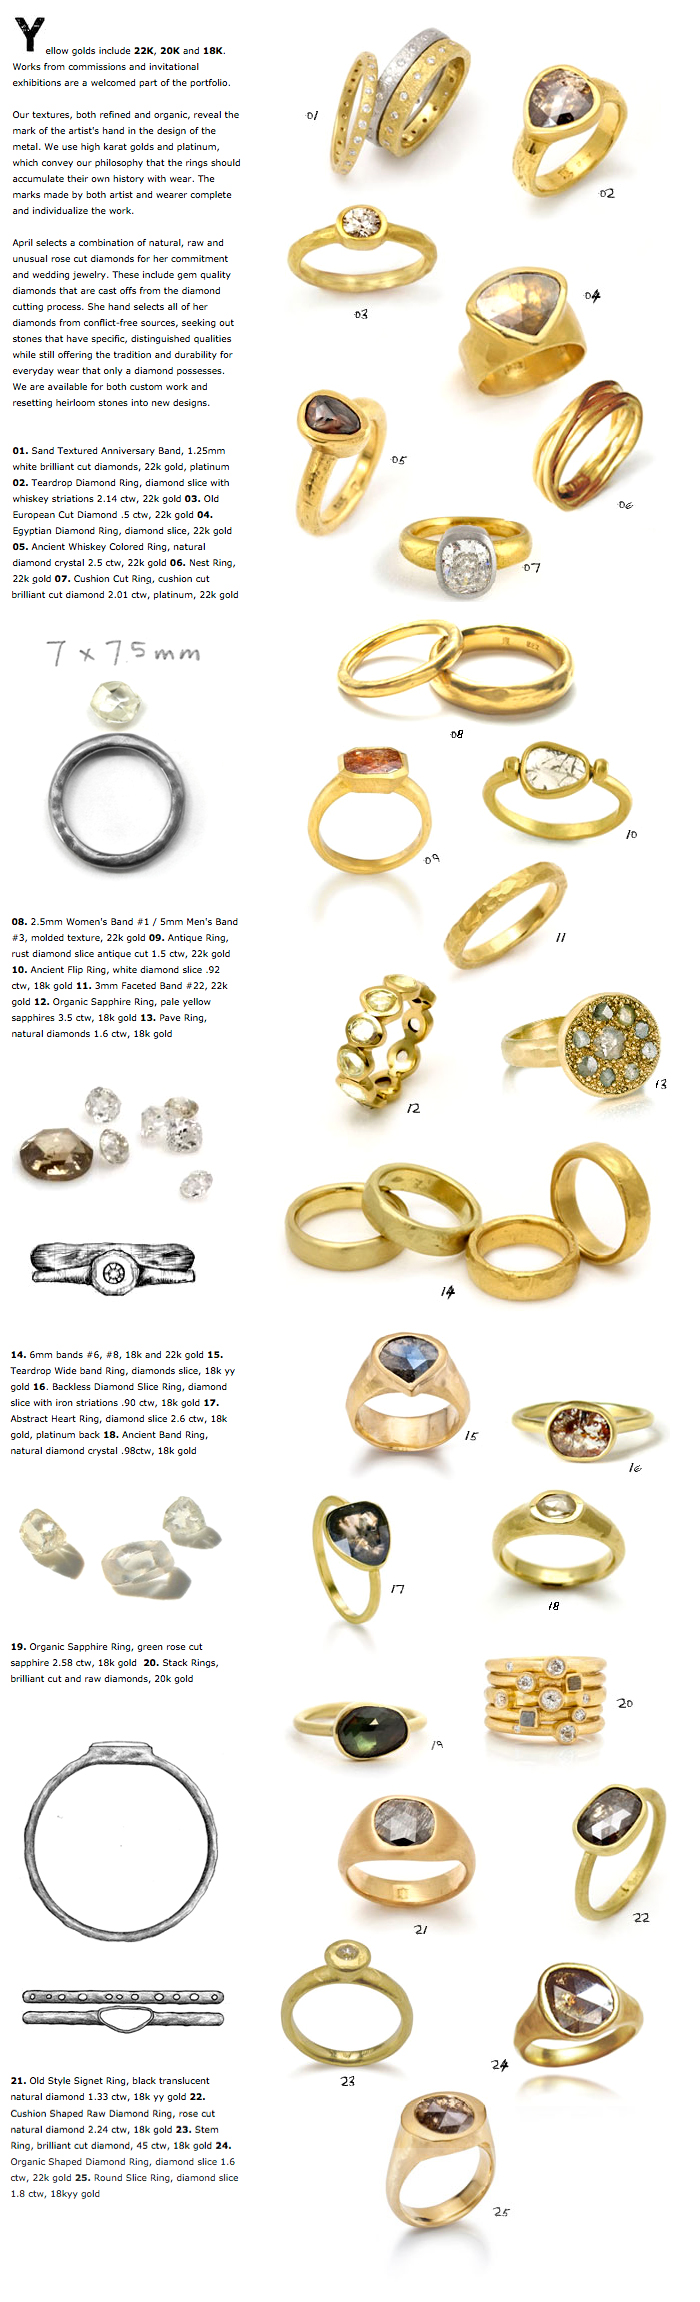 Special-rings-yellow-april-higashi.jpg